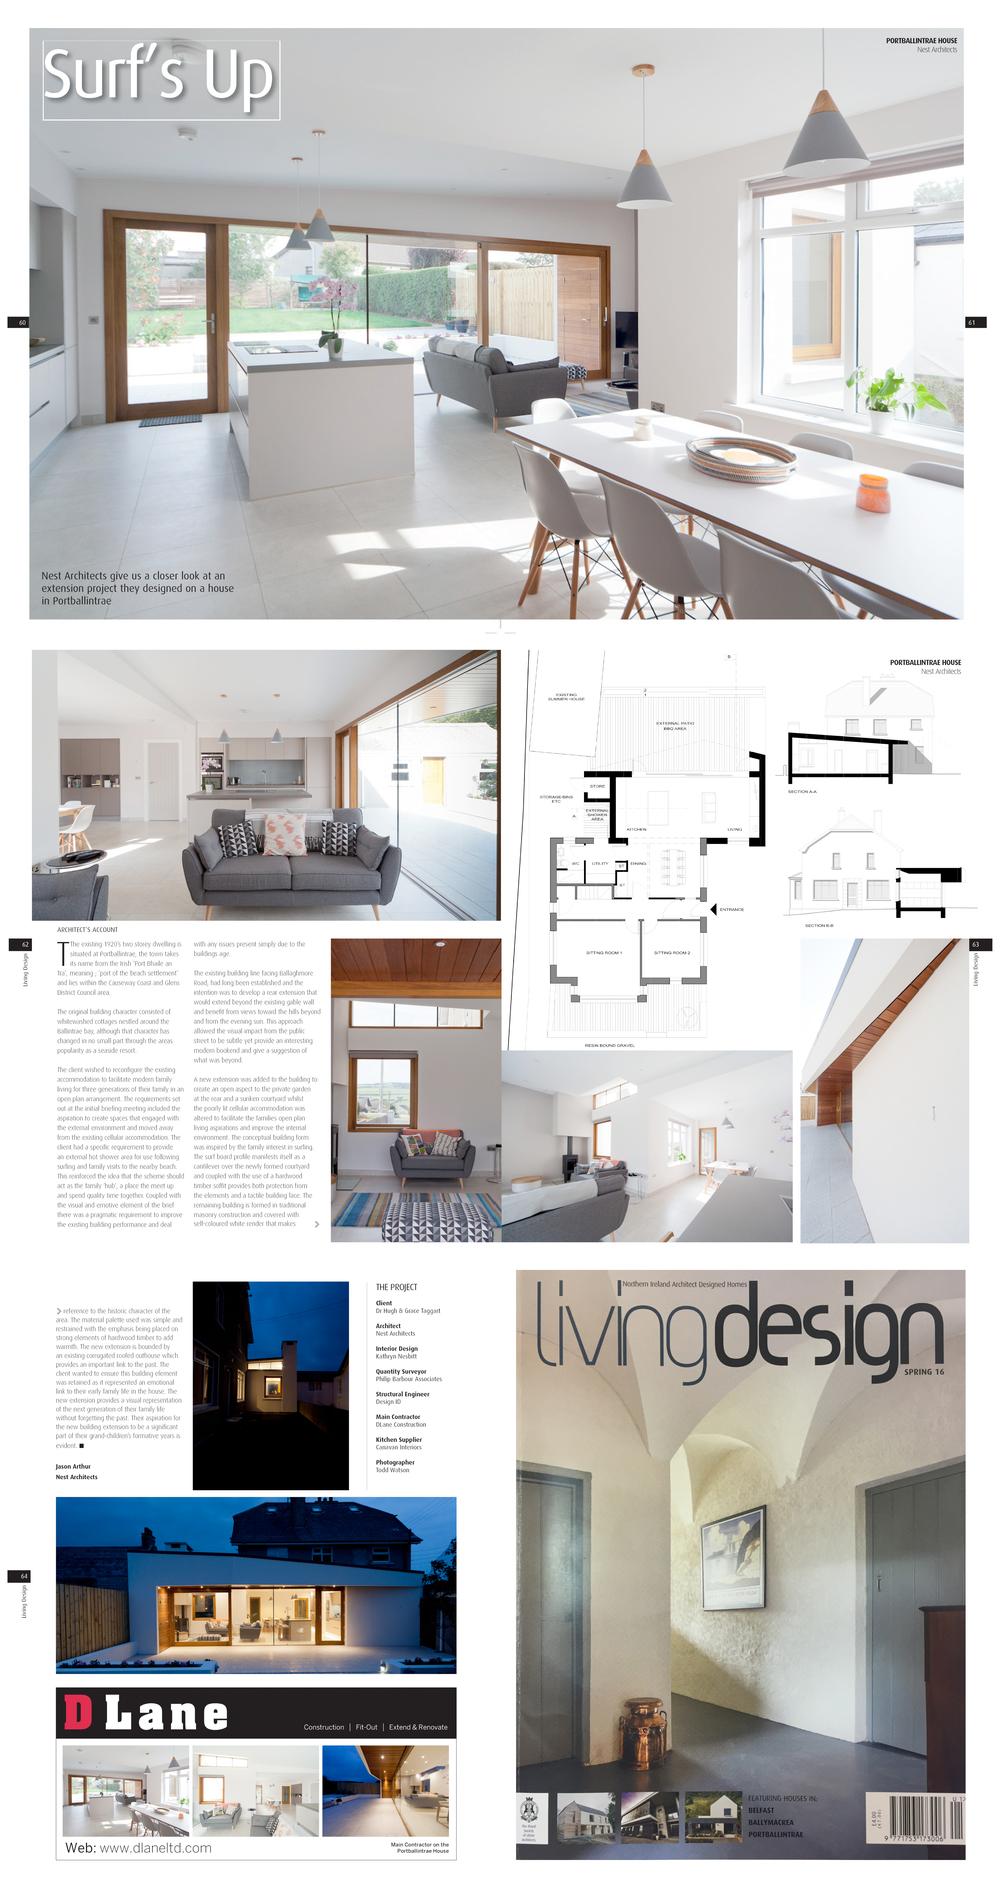 Publication of Living Design for Nest Architects - Modern Extension in Portballintrae.jpg